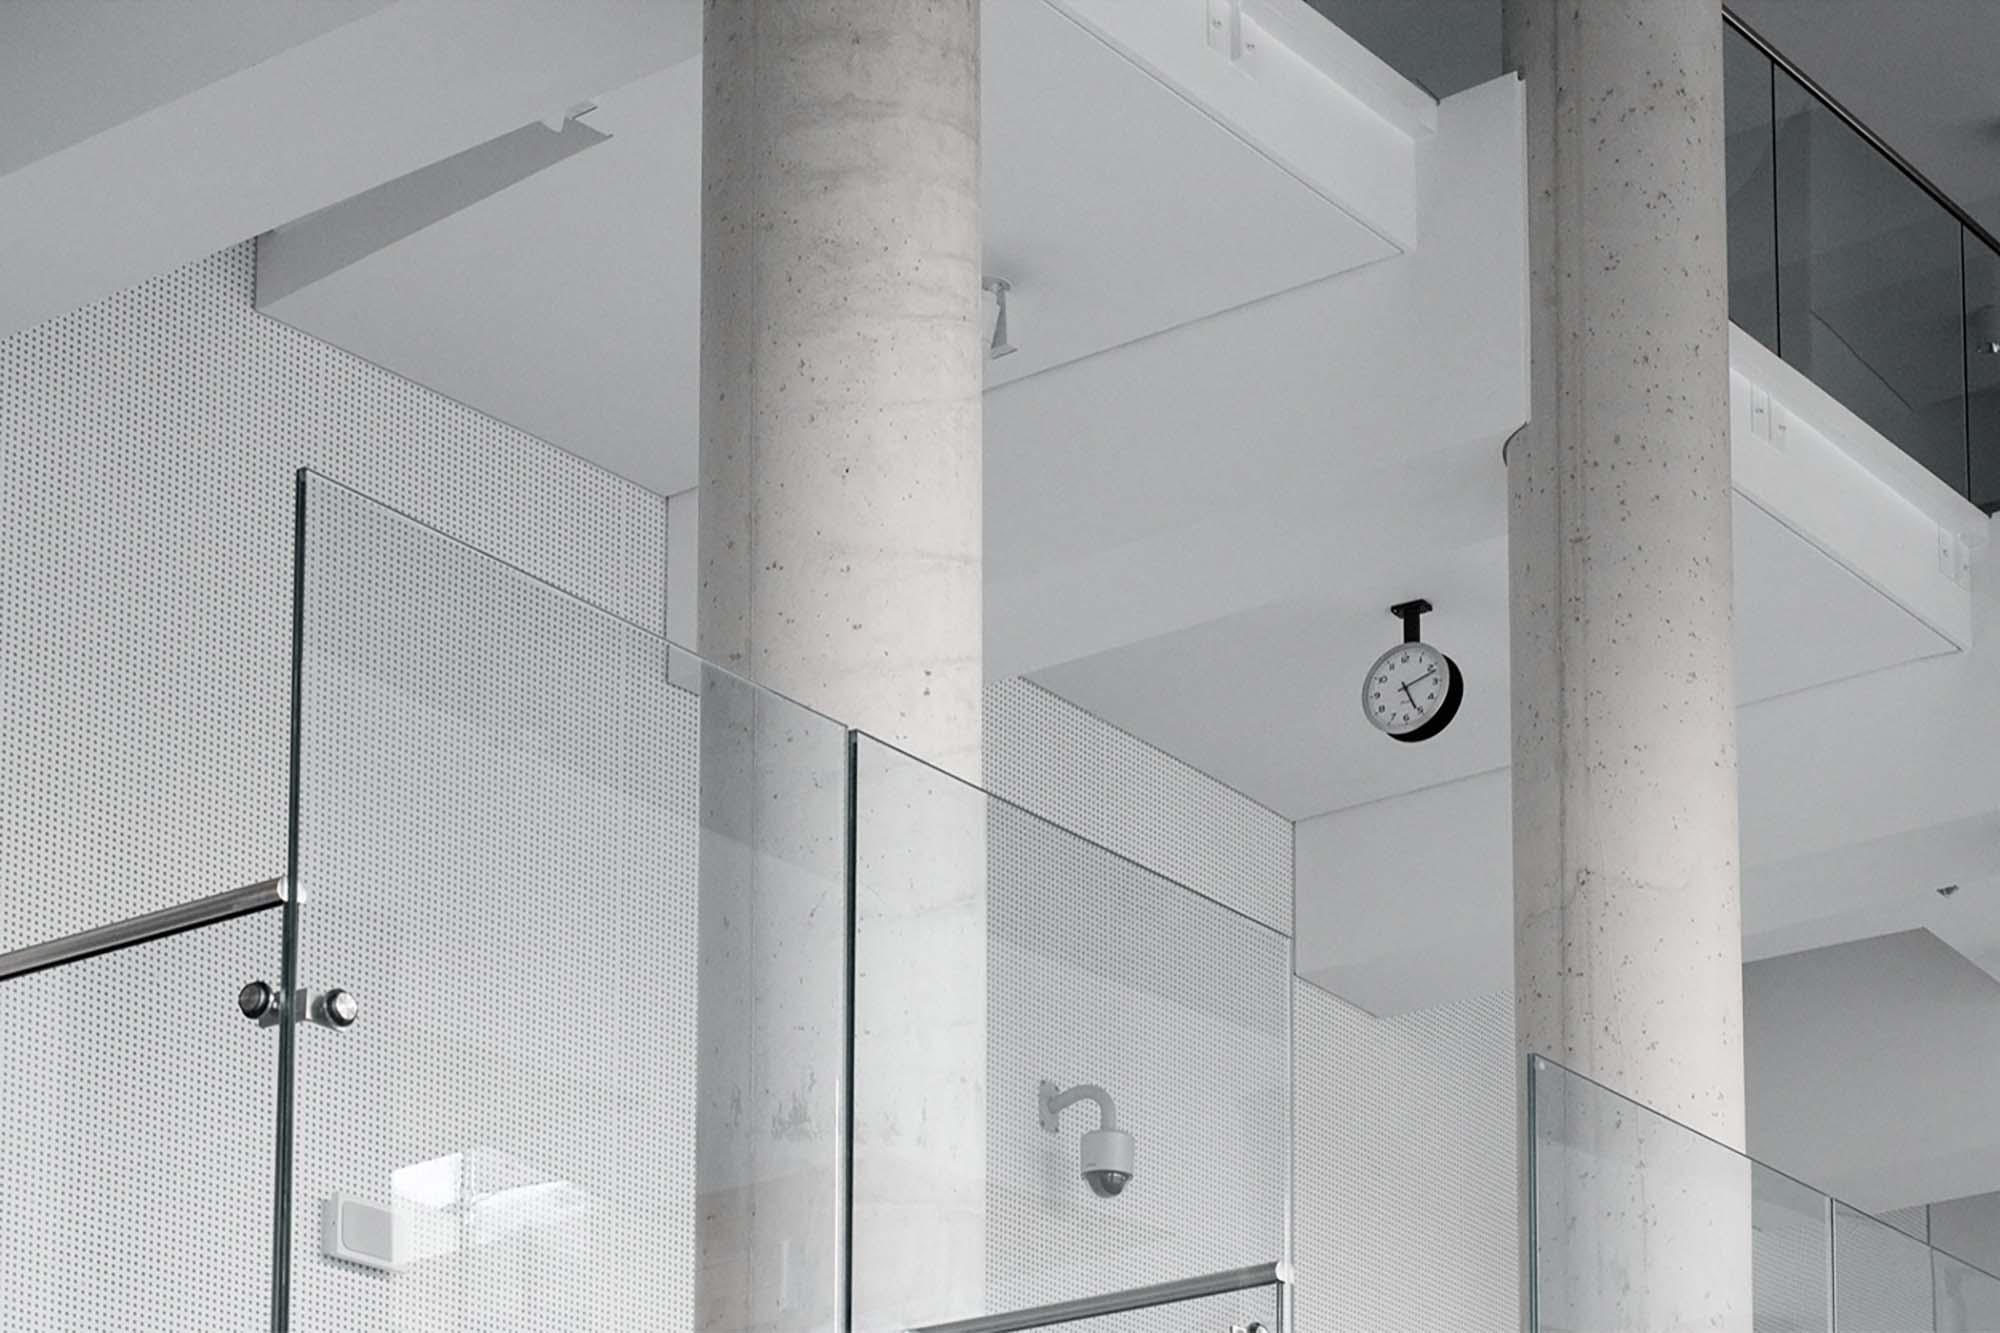 Office Glass Branding Mockup 2